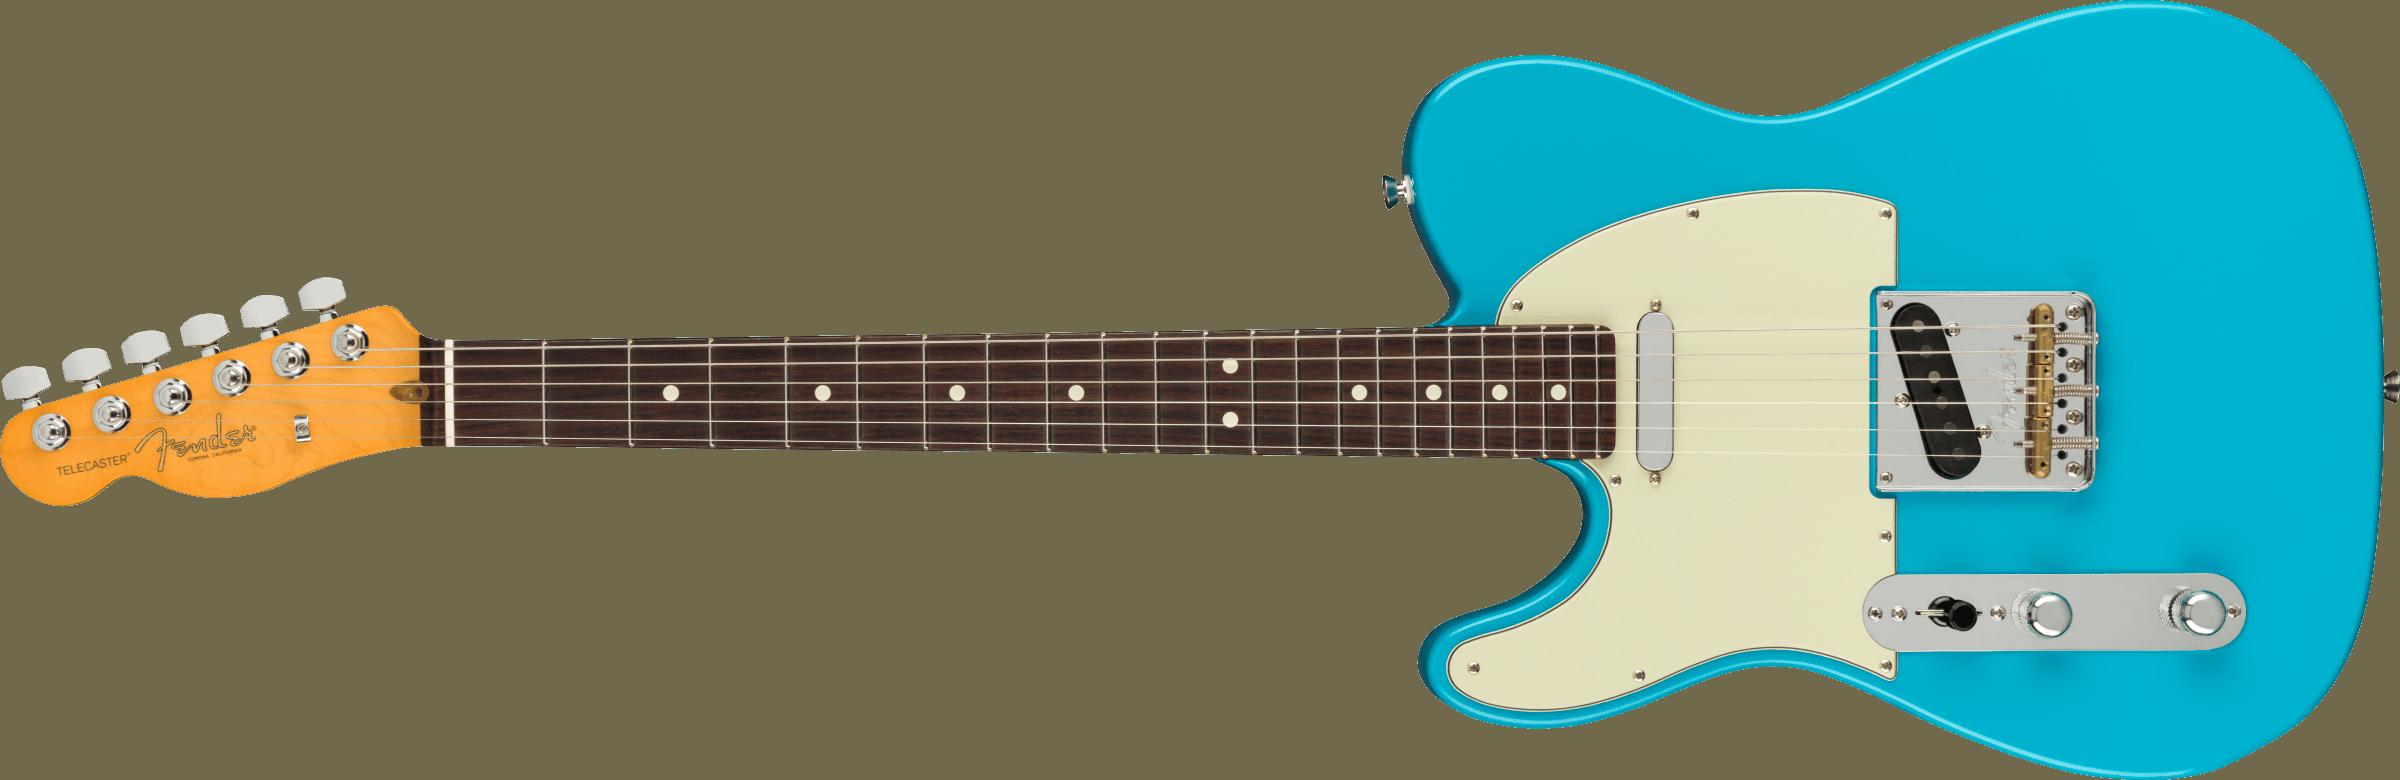 Fender American Professional II Telecaster® Left-Hand, Rosewood Fingerboard, Miami Blue